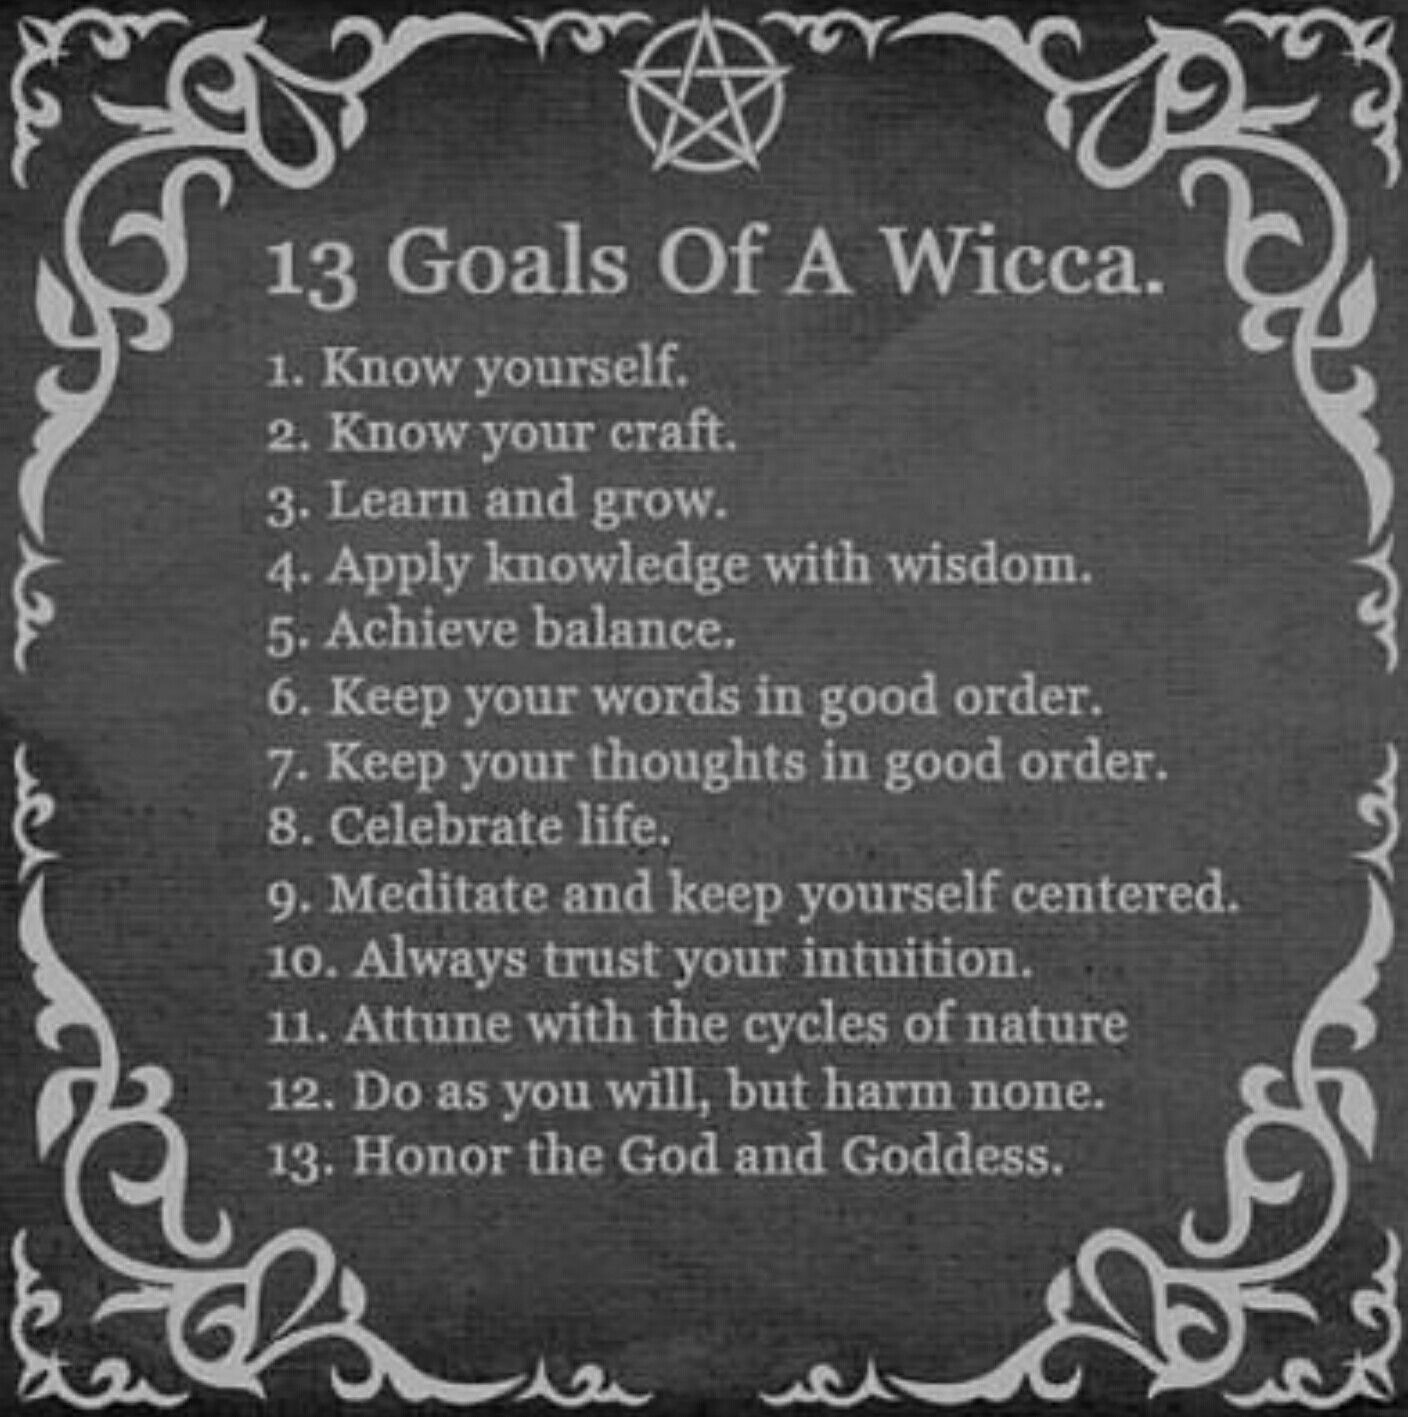 13 Goals of Wicca